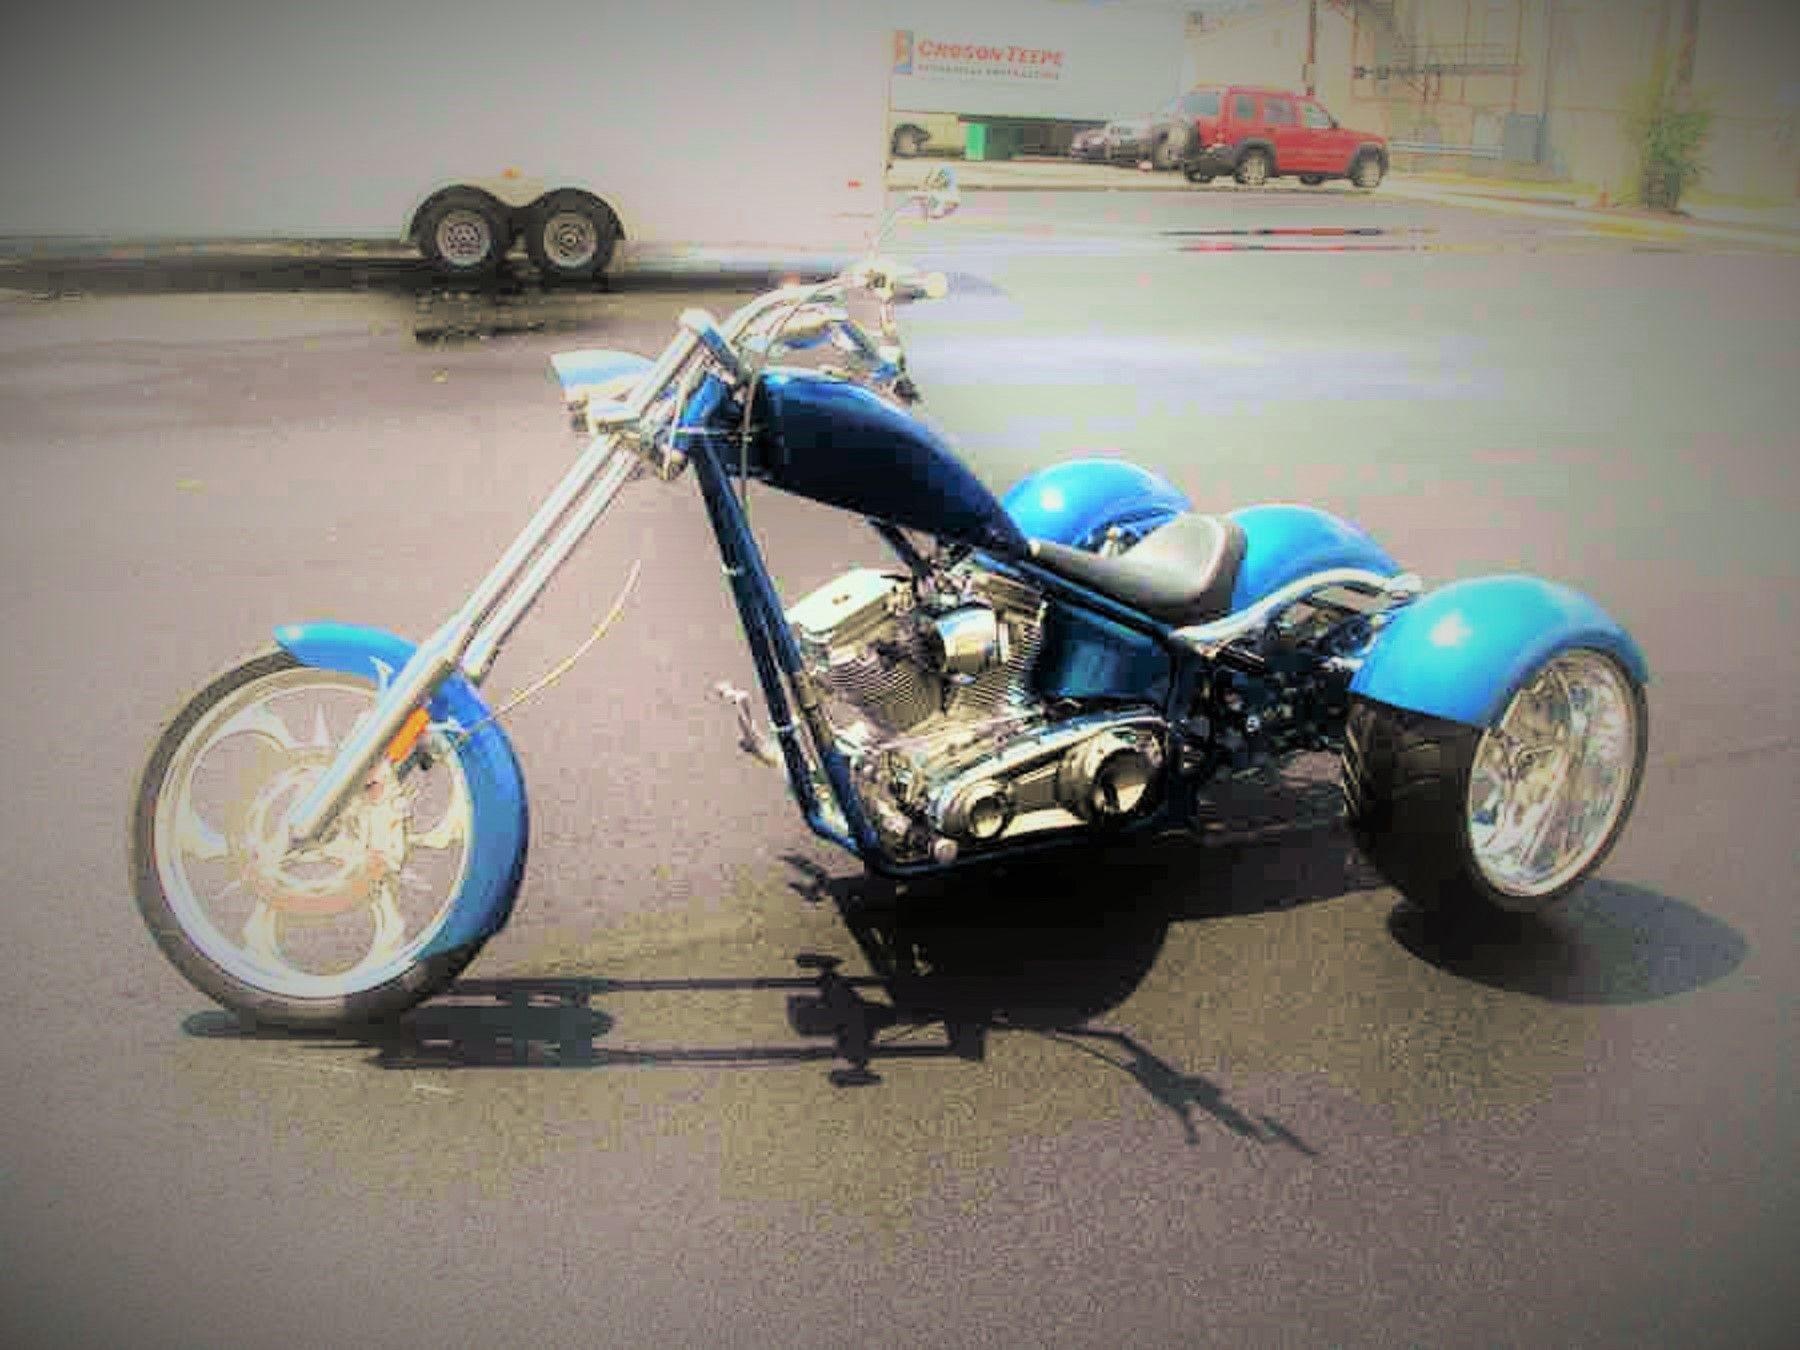 Kmw Aka 300 Wide Big Dog Motorcycle K9 With Images Big Dog